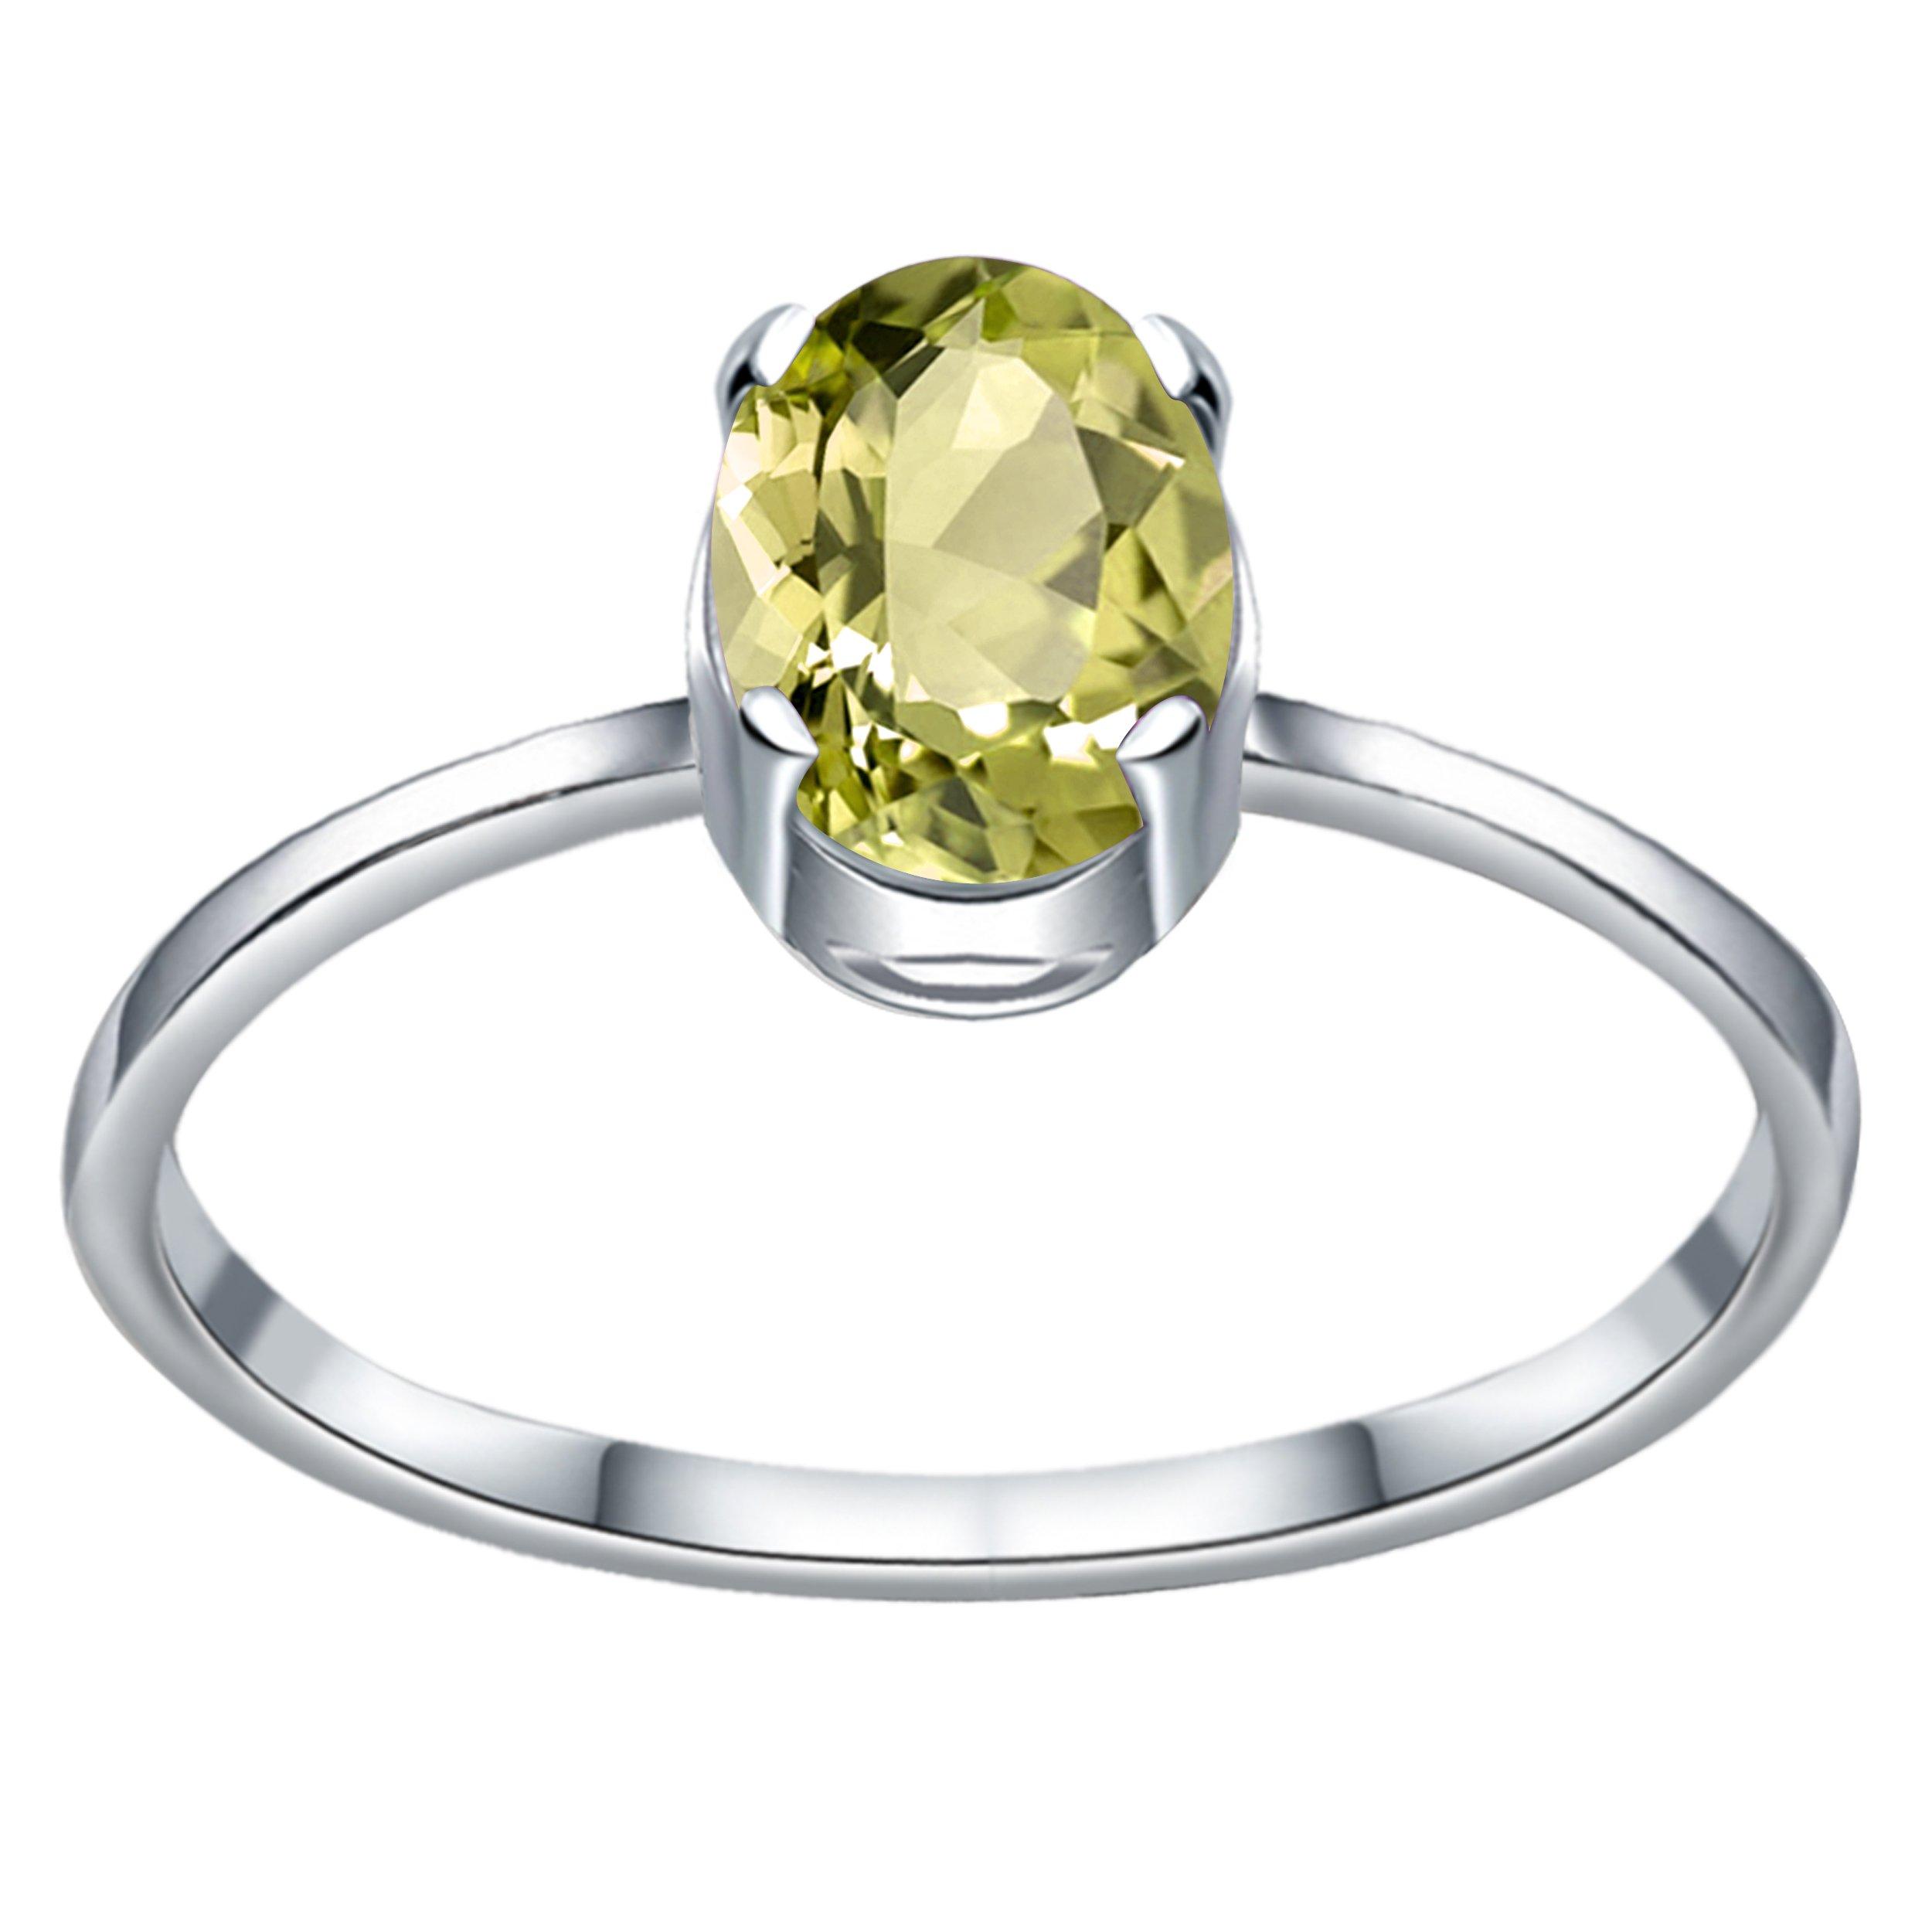 925 Sterling Silver 0.75 Carat Lemon Quartz Ring